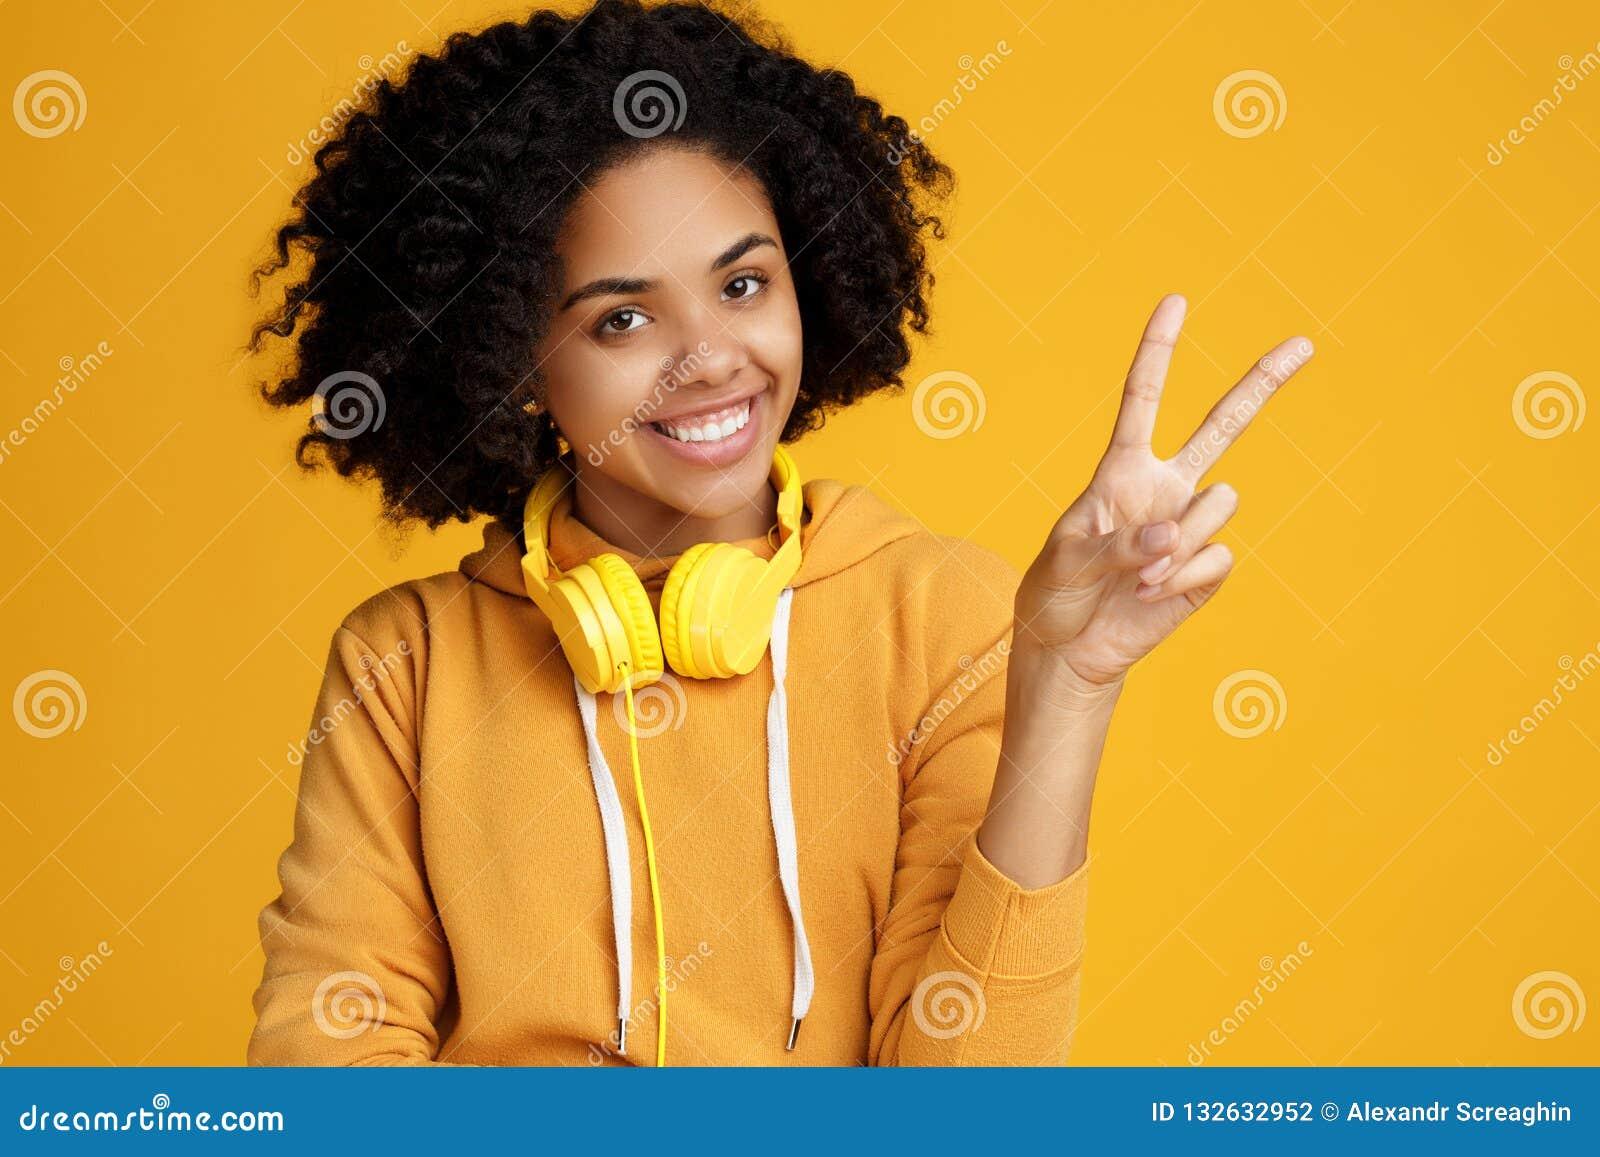 De knappe Afrikaanse Amerikaanse jonge vrouw met heldere glimlach kleedde zich in vrijetijdskleding en hoofdtelefoons die vredesg